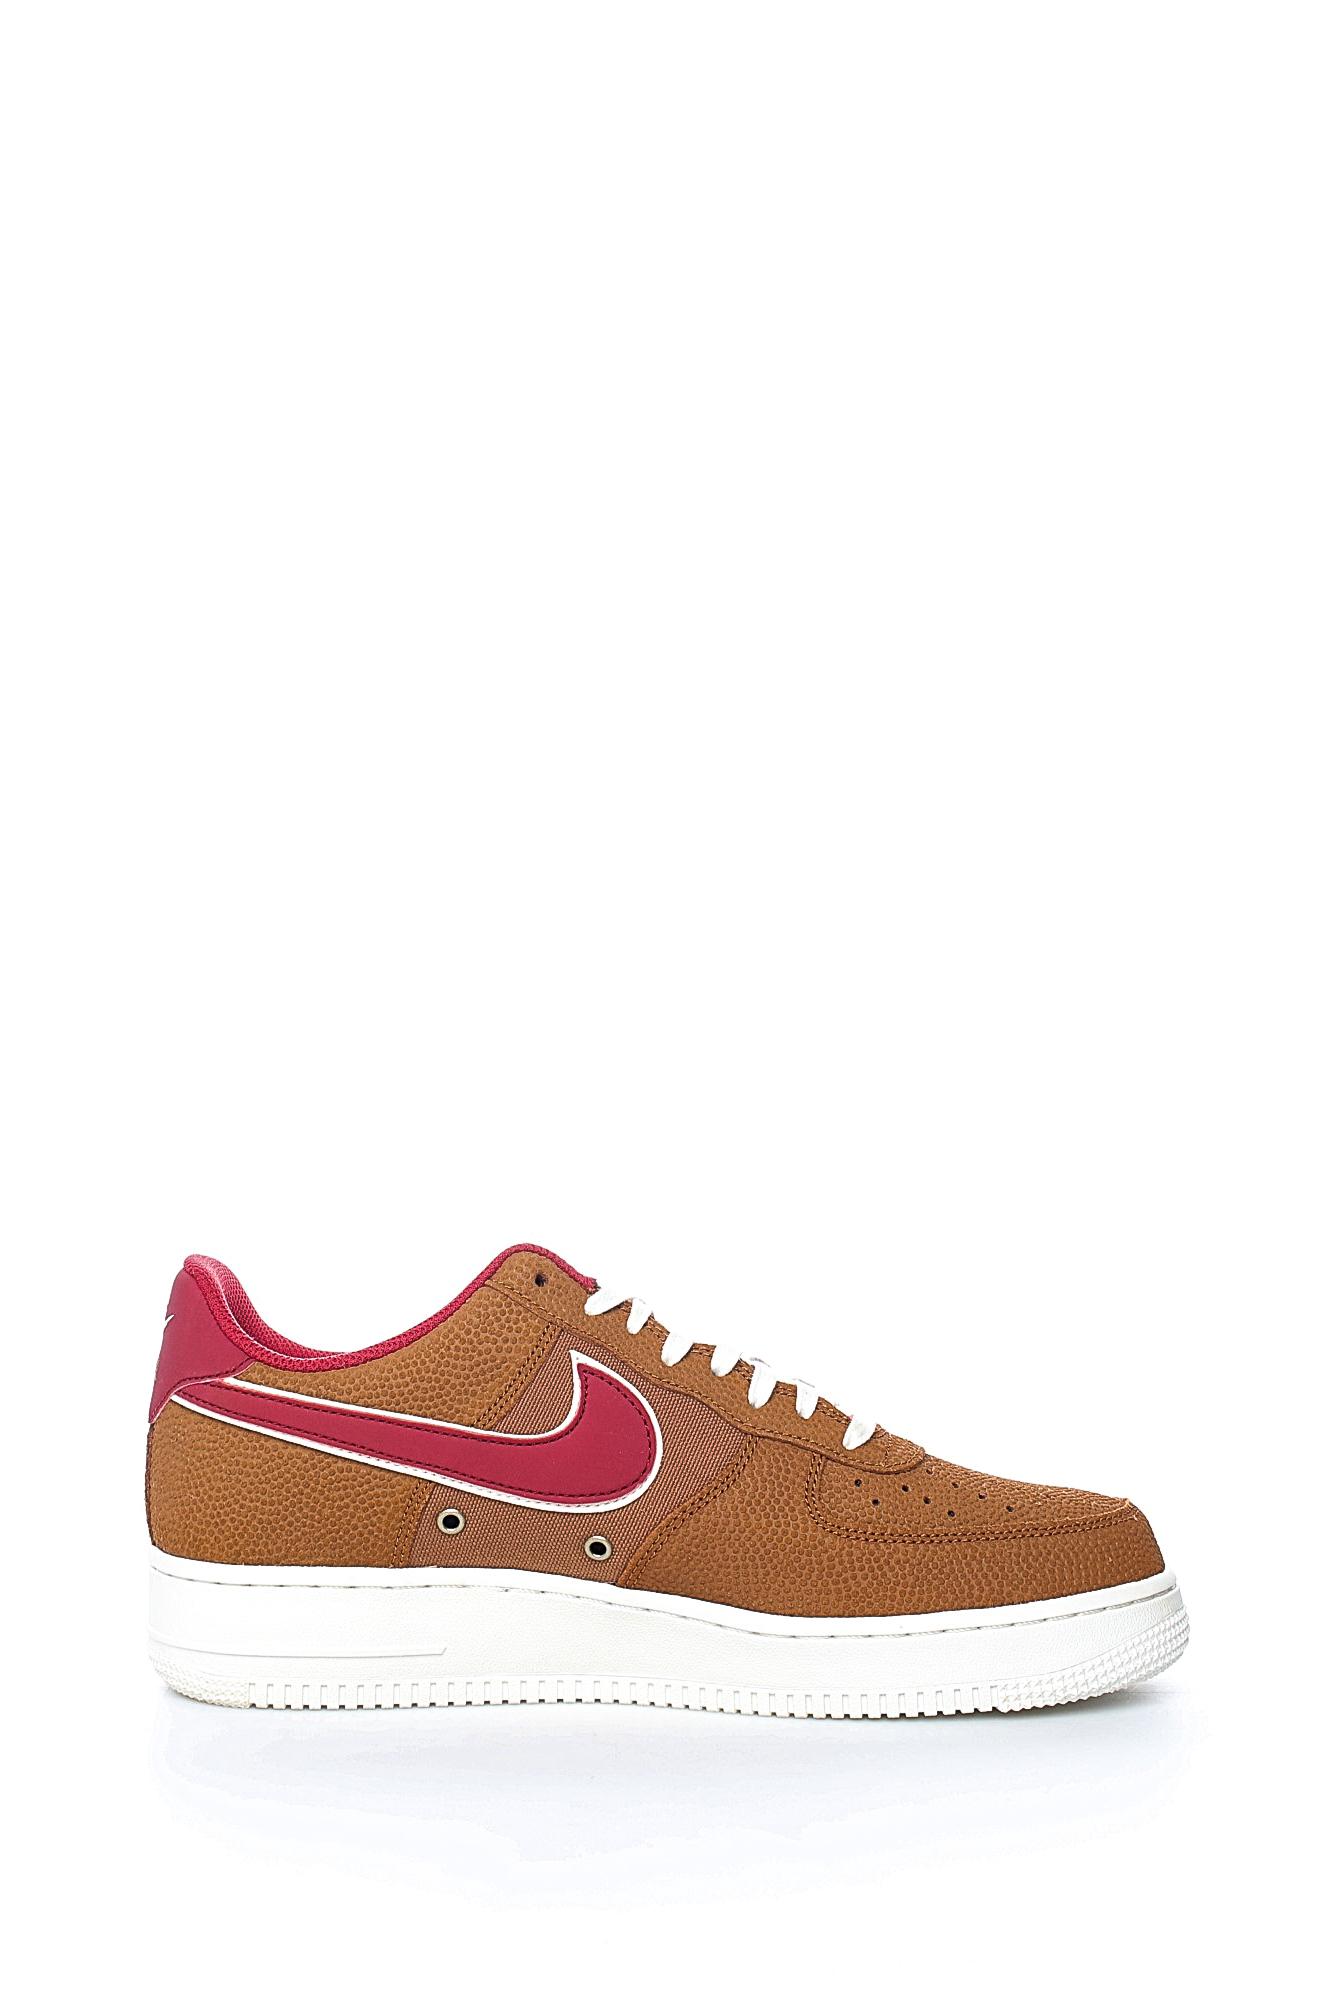 NIKE – Ανδρικά παπούτσια NIKE AIR FORCE 1 '07 LV8 καφέ